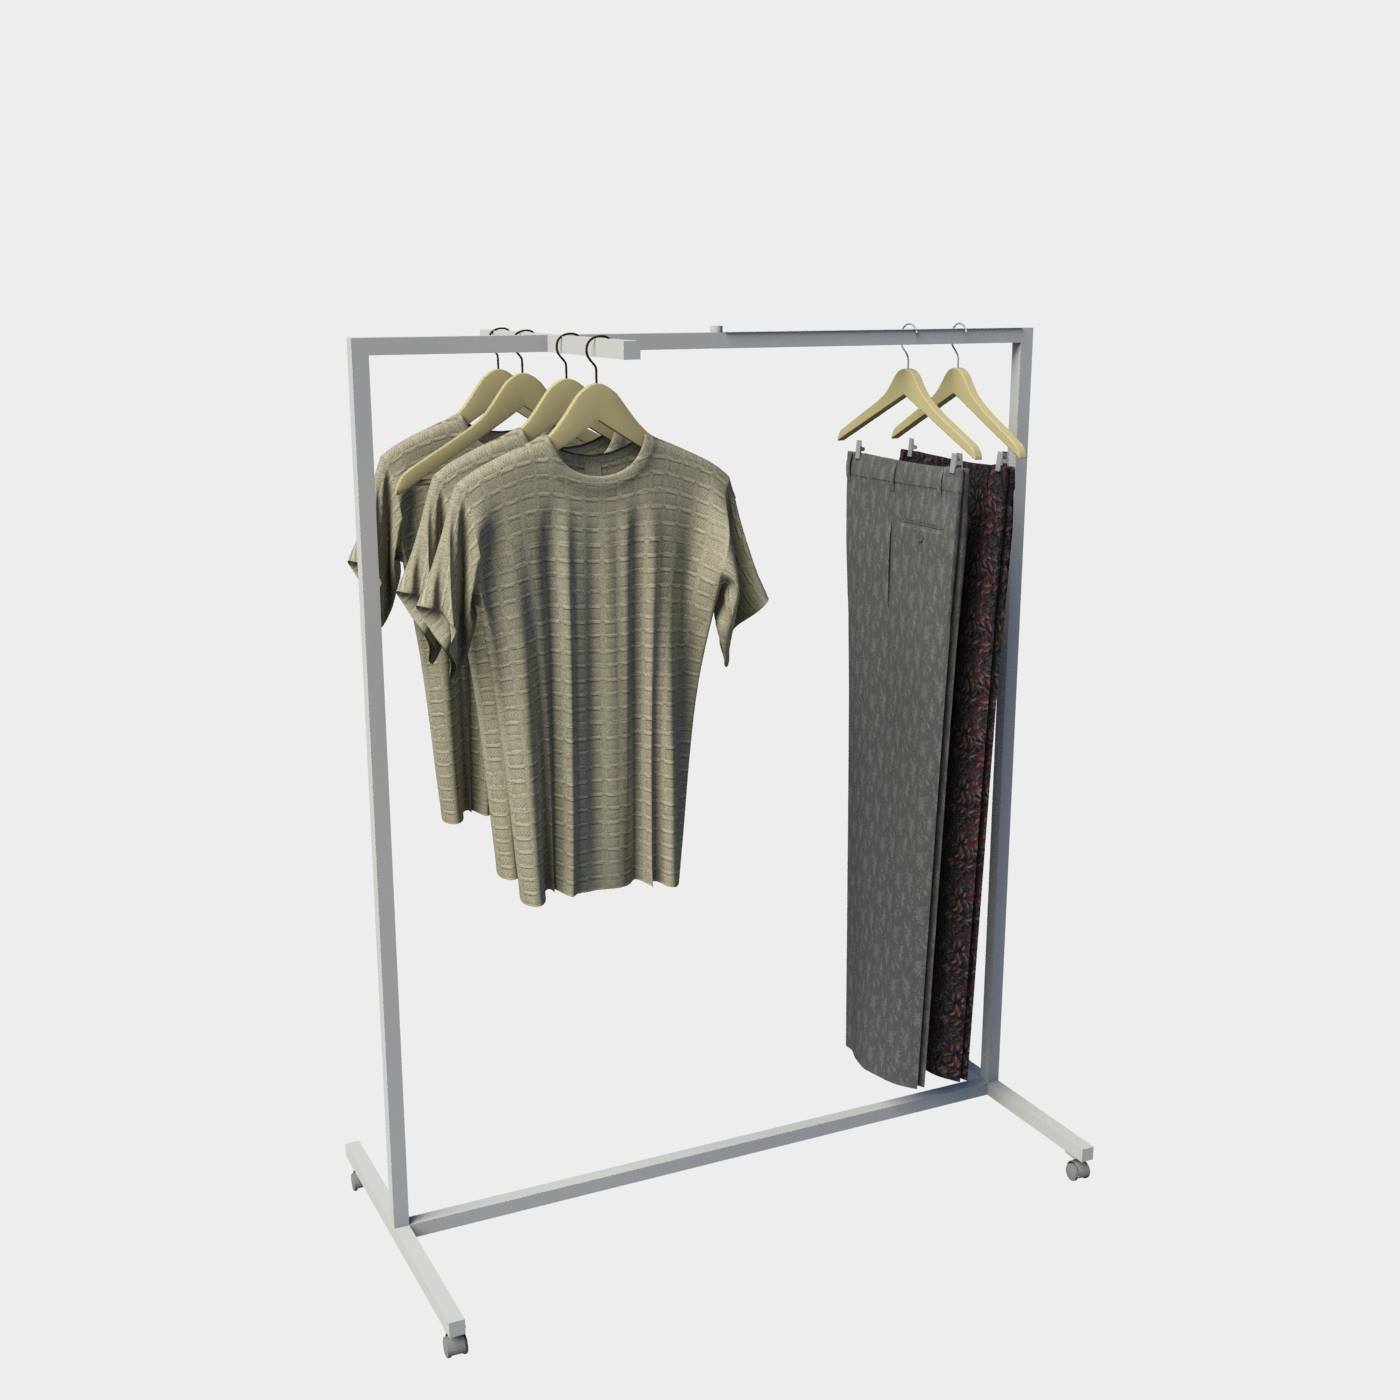 Stand επιδαπέδιο ρούχων καταστημάτων έπιπλα καταστήματος διακόσμηση εξοπλισμός ένδυσης